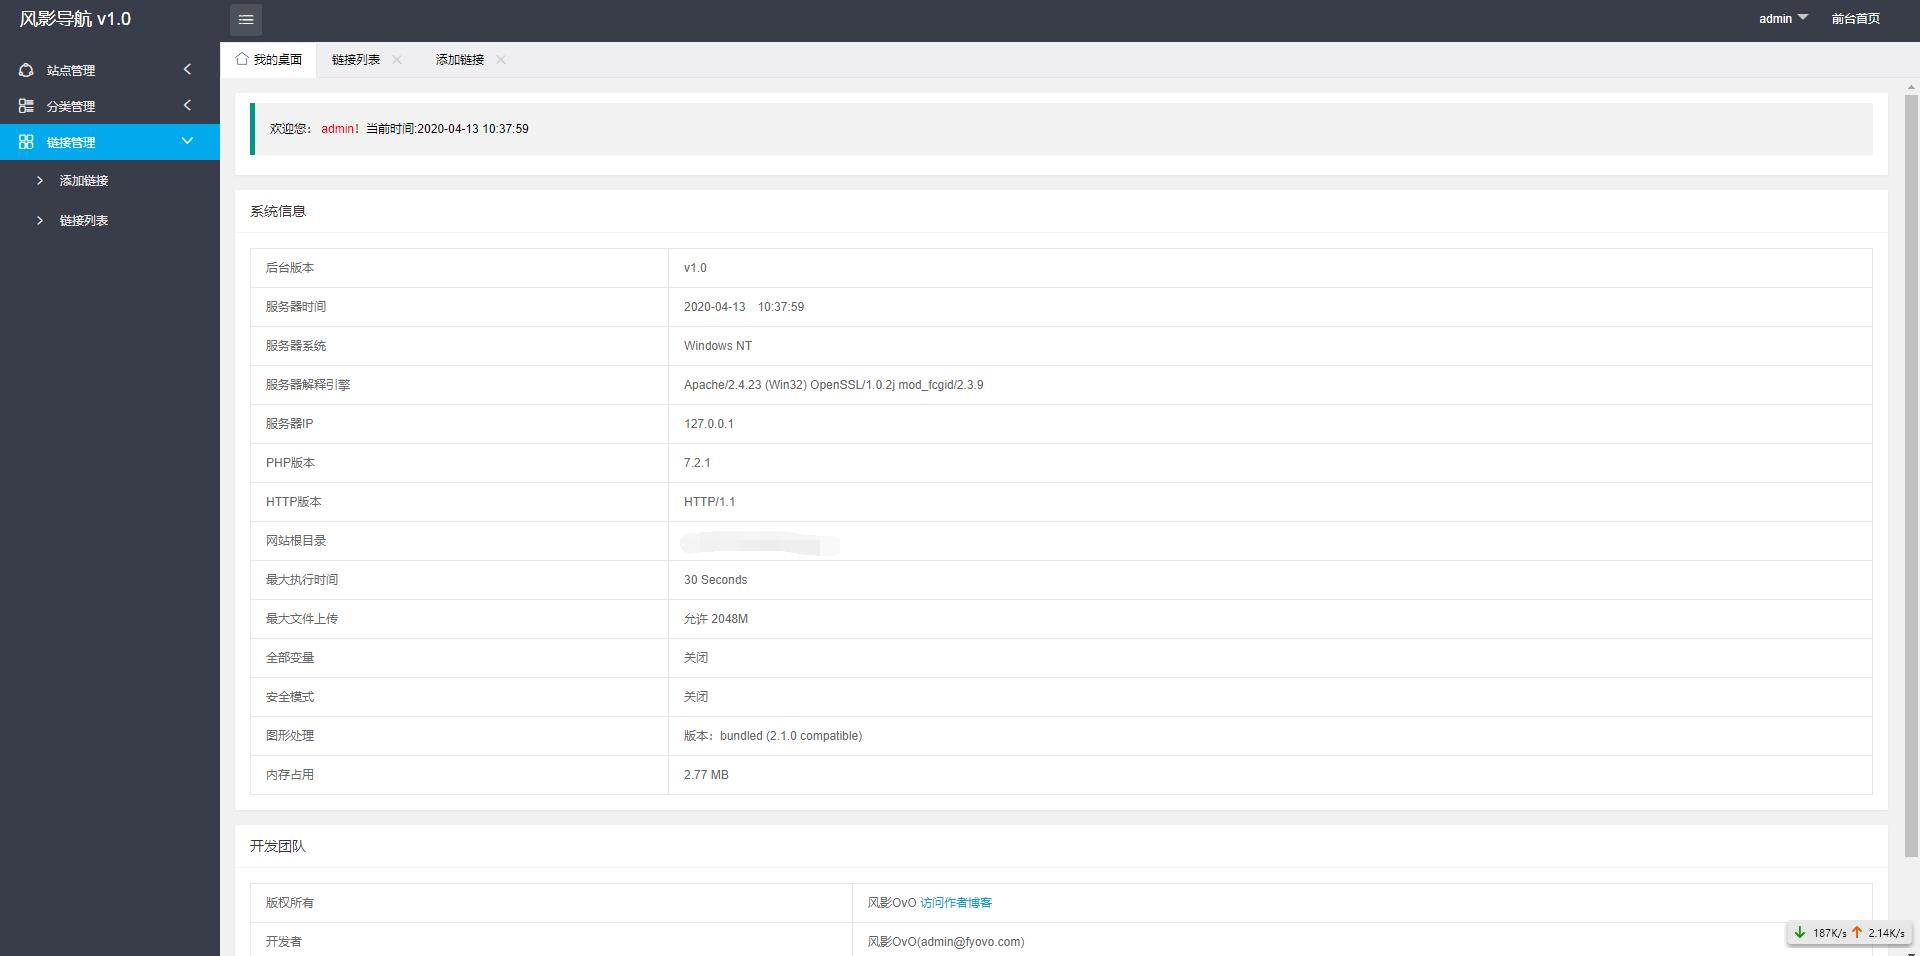 风影导航v1.0PHP源码 带后台 第2张